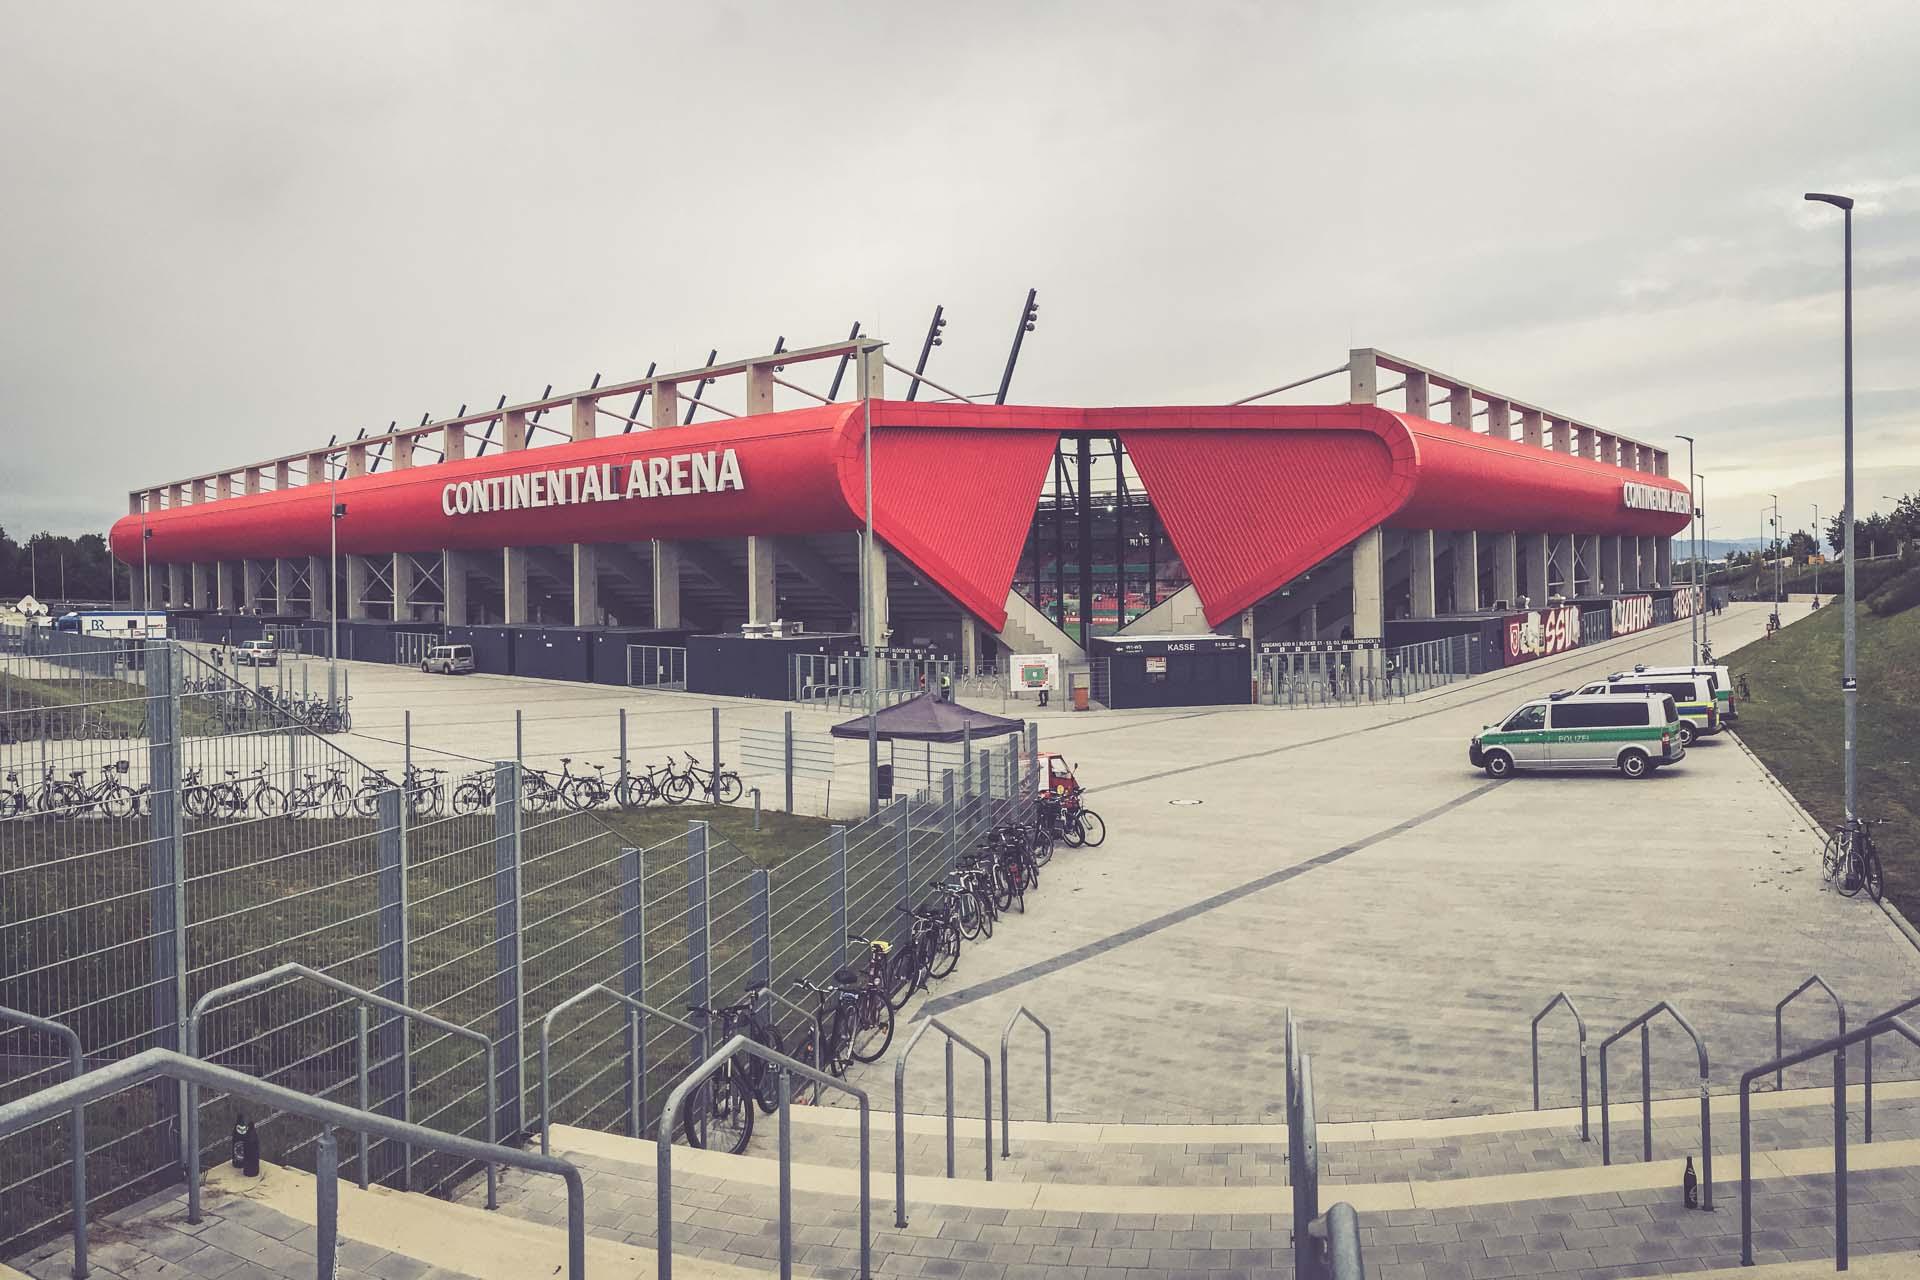 Continental Arena